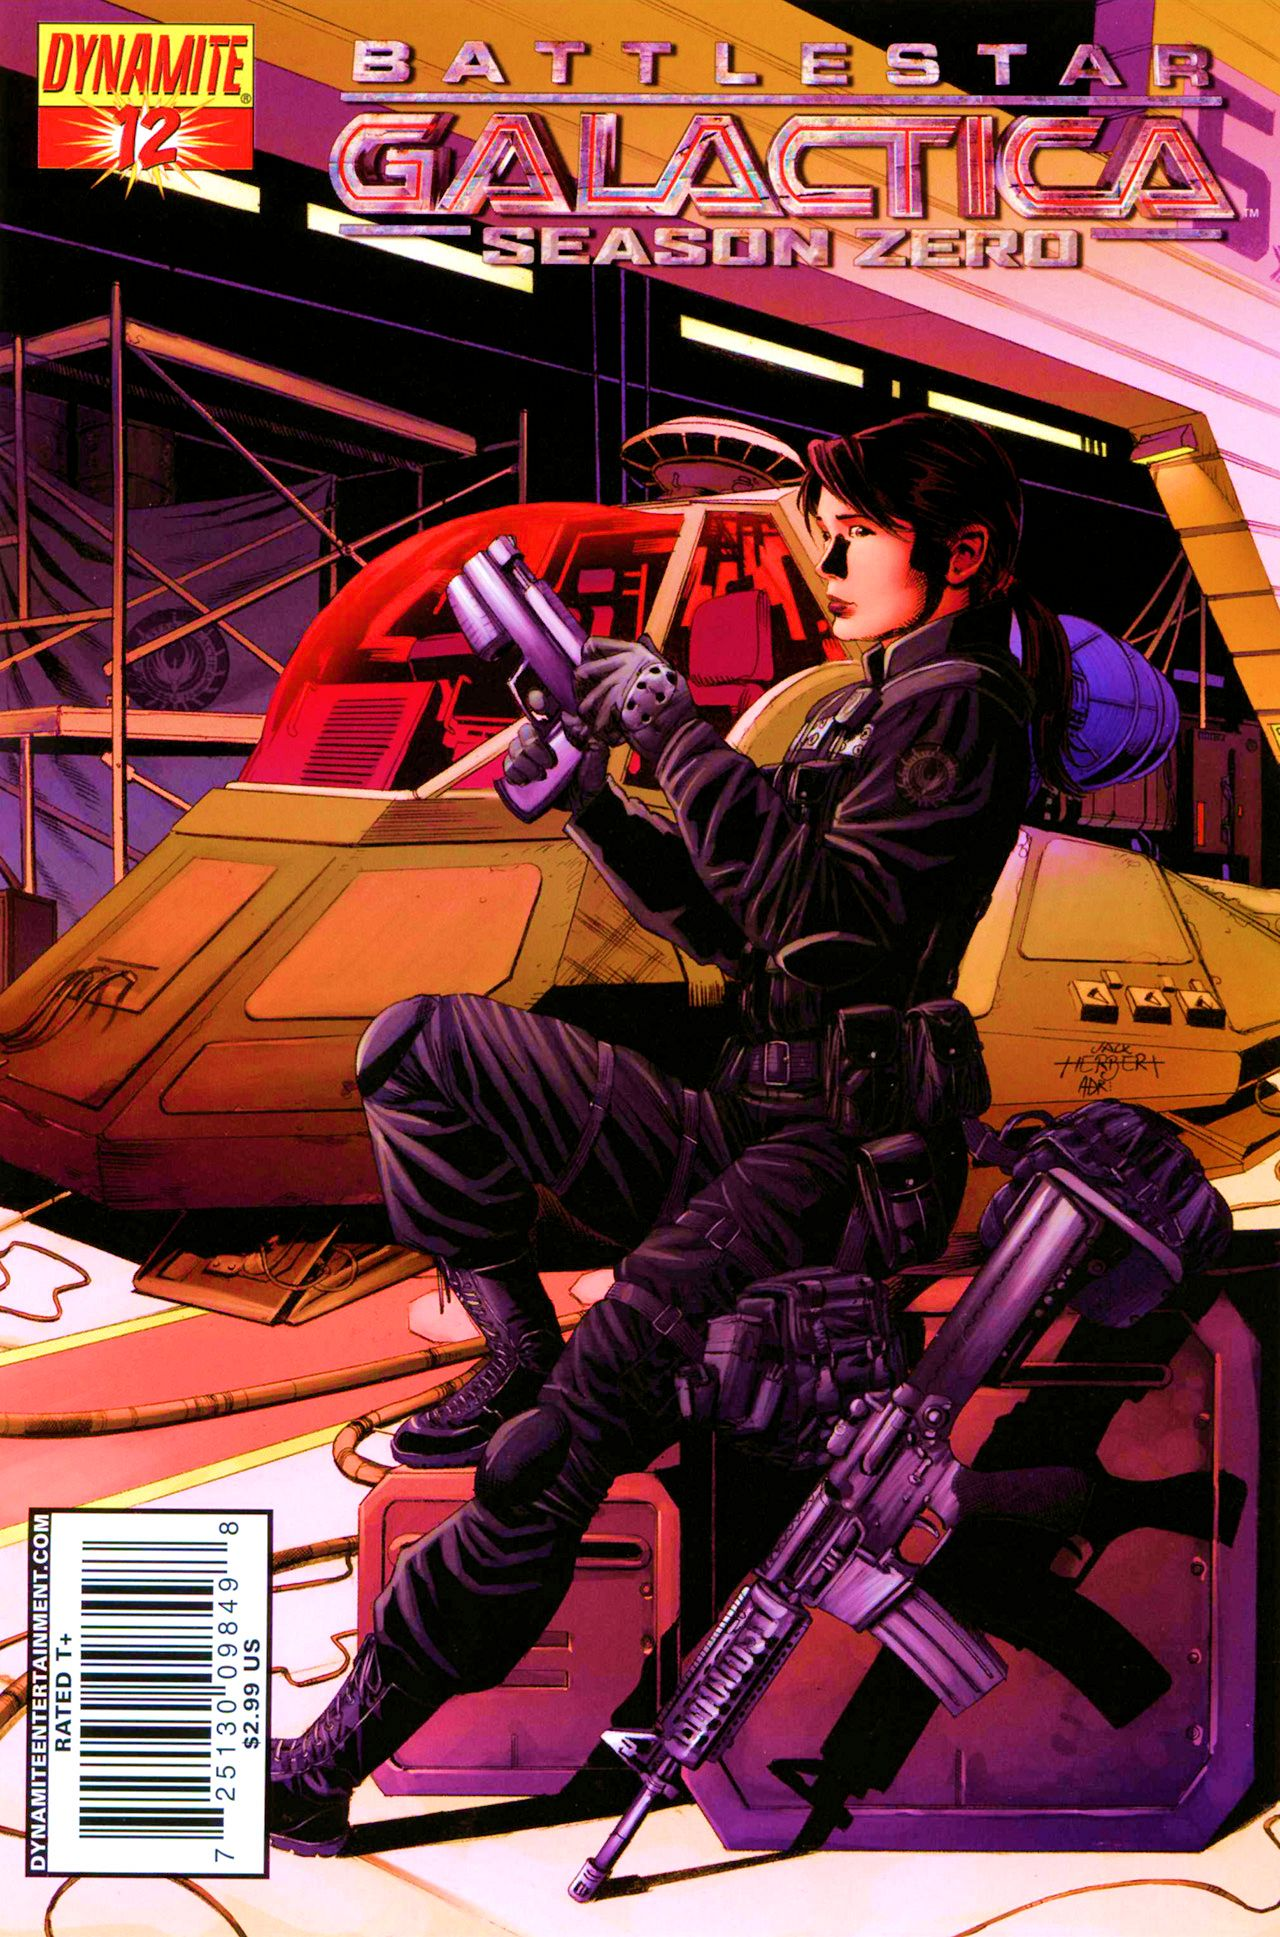 Battlestar Galactica: Season Zero 12 Page 1